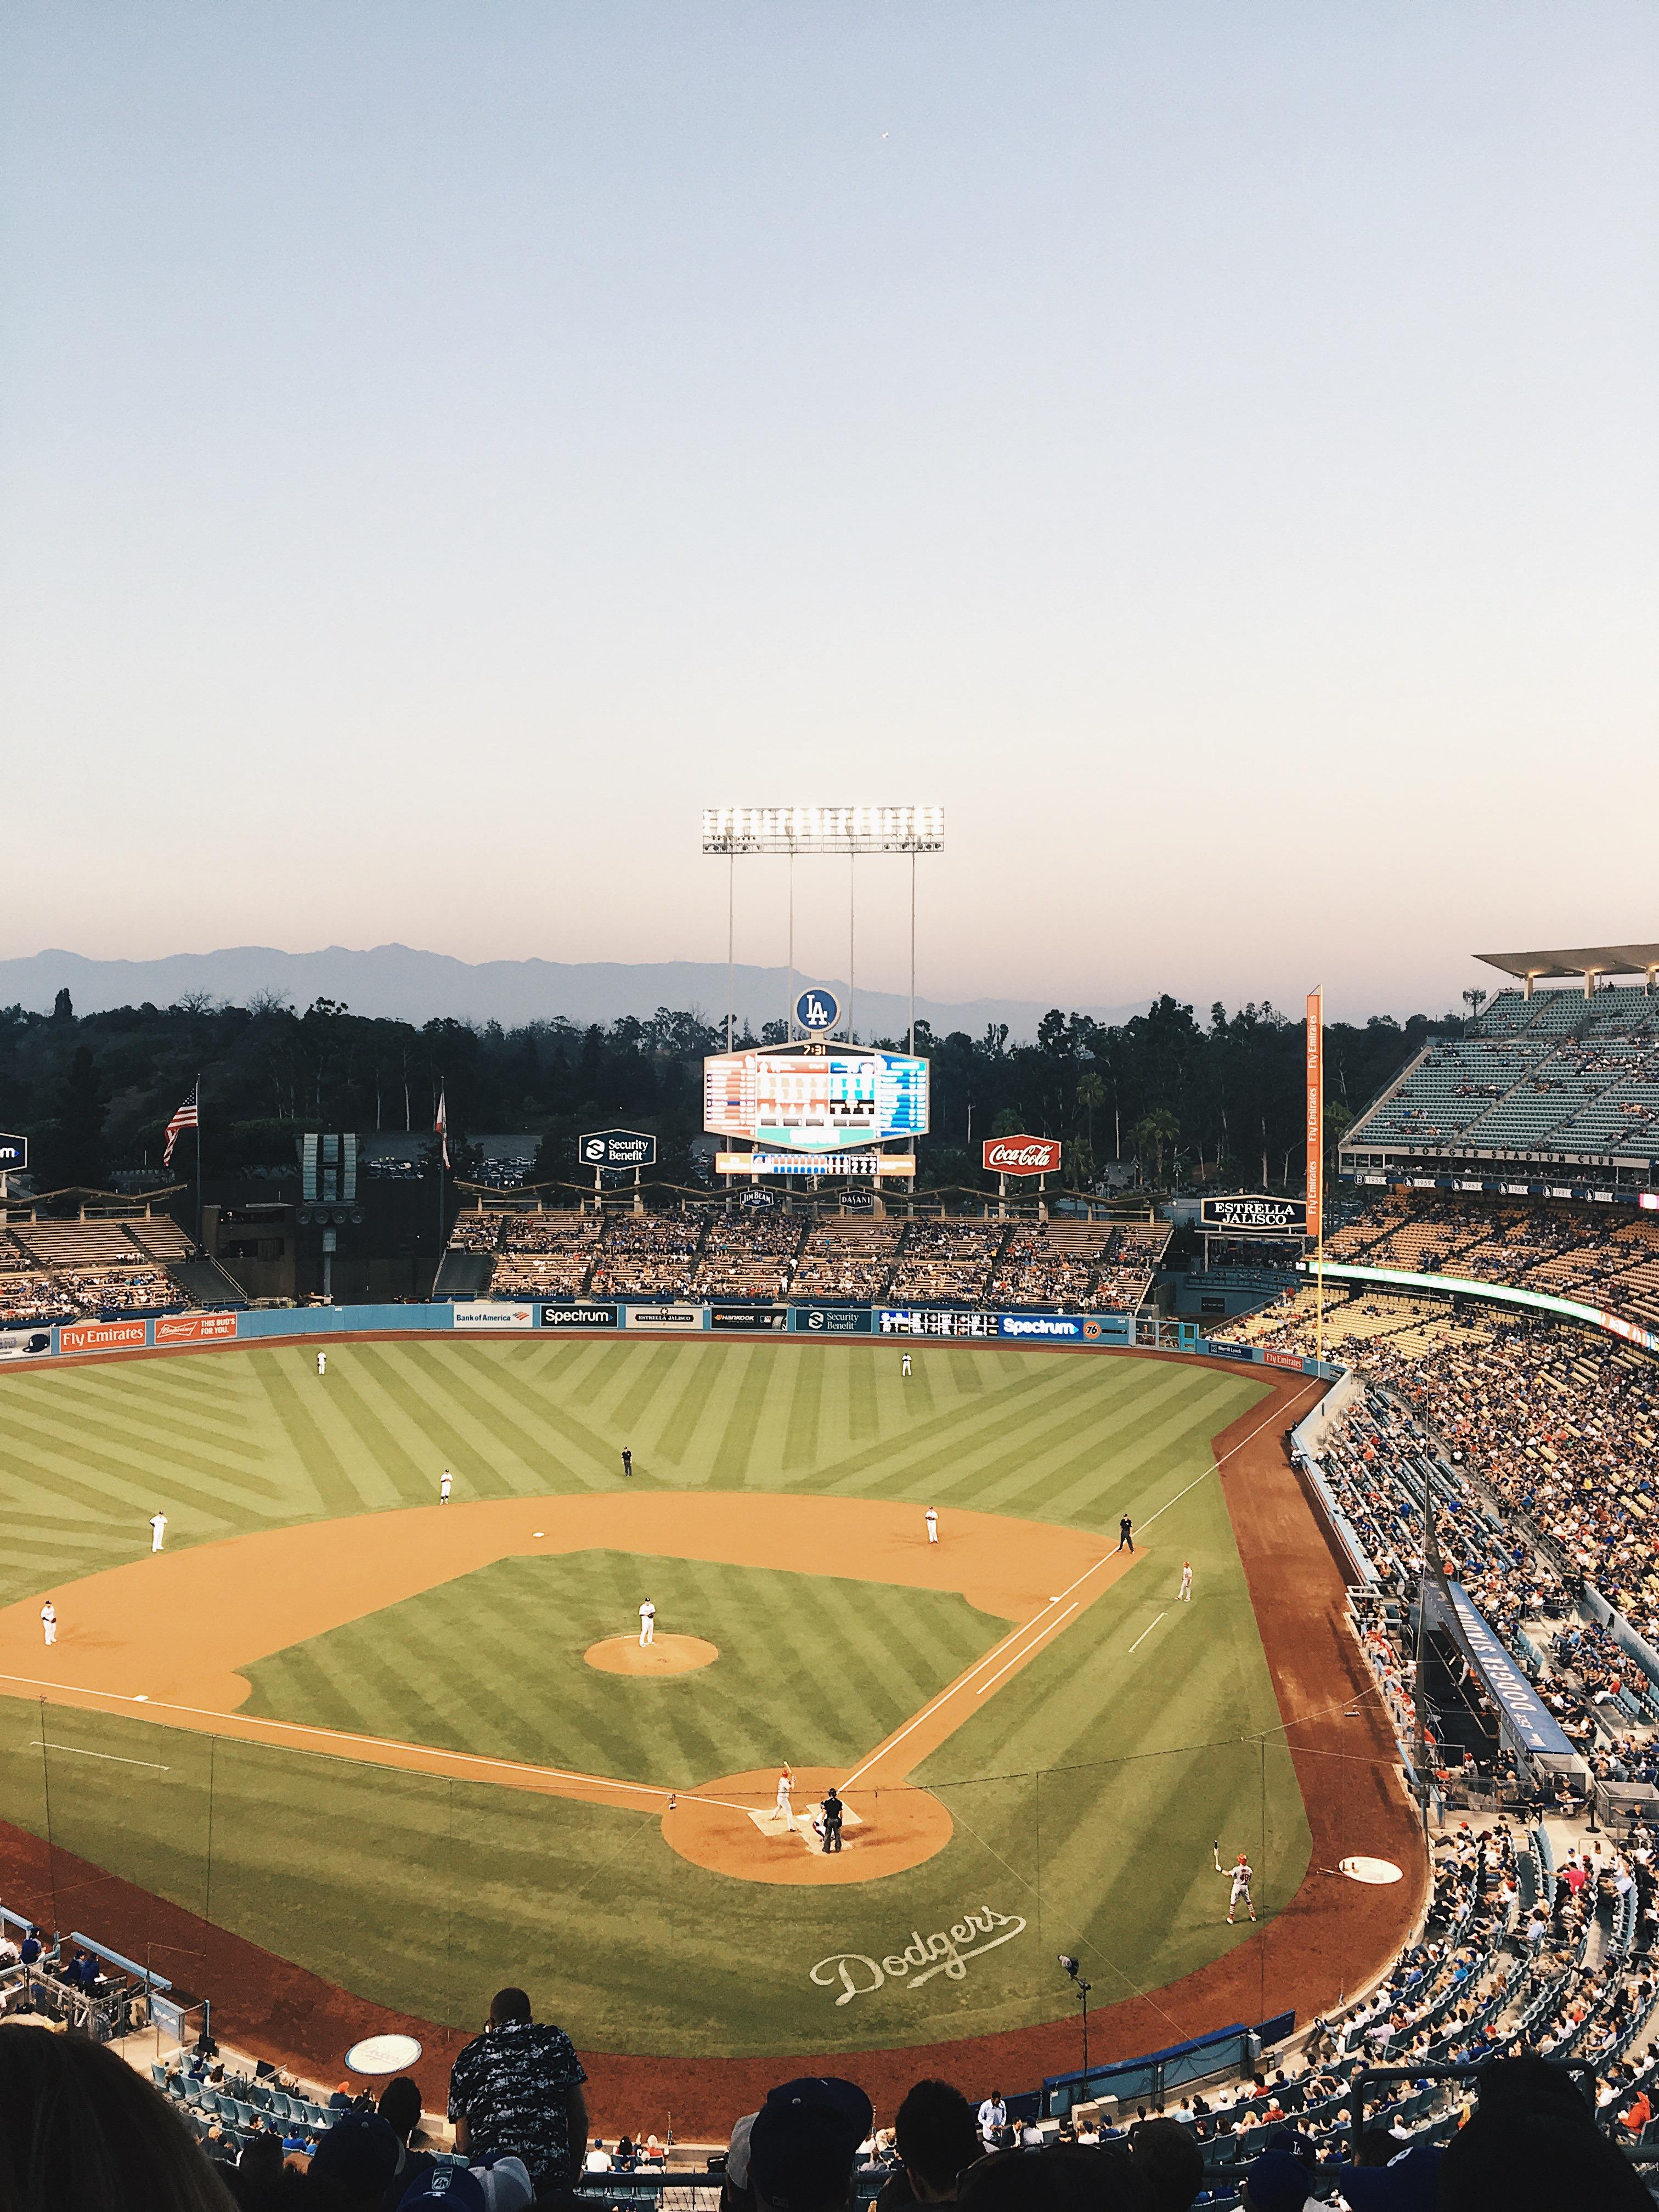 Baseball game dodgers